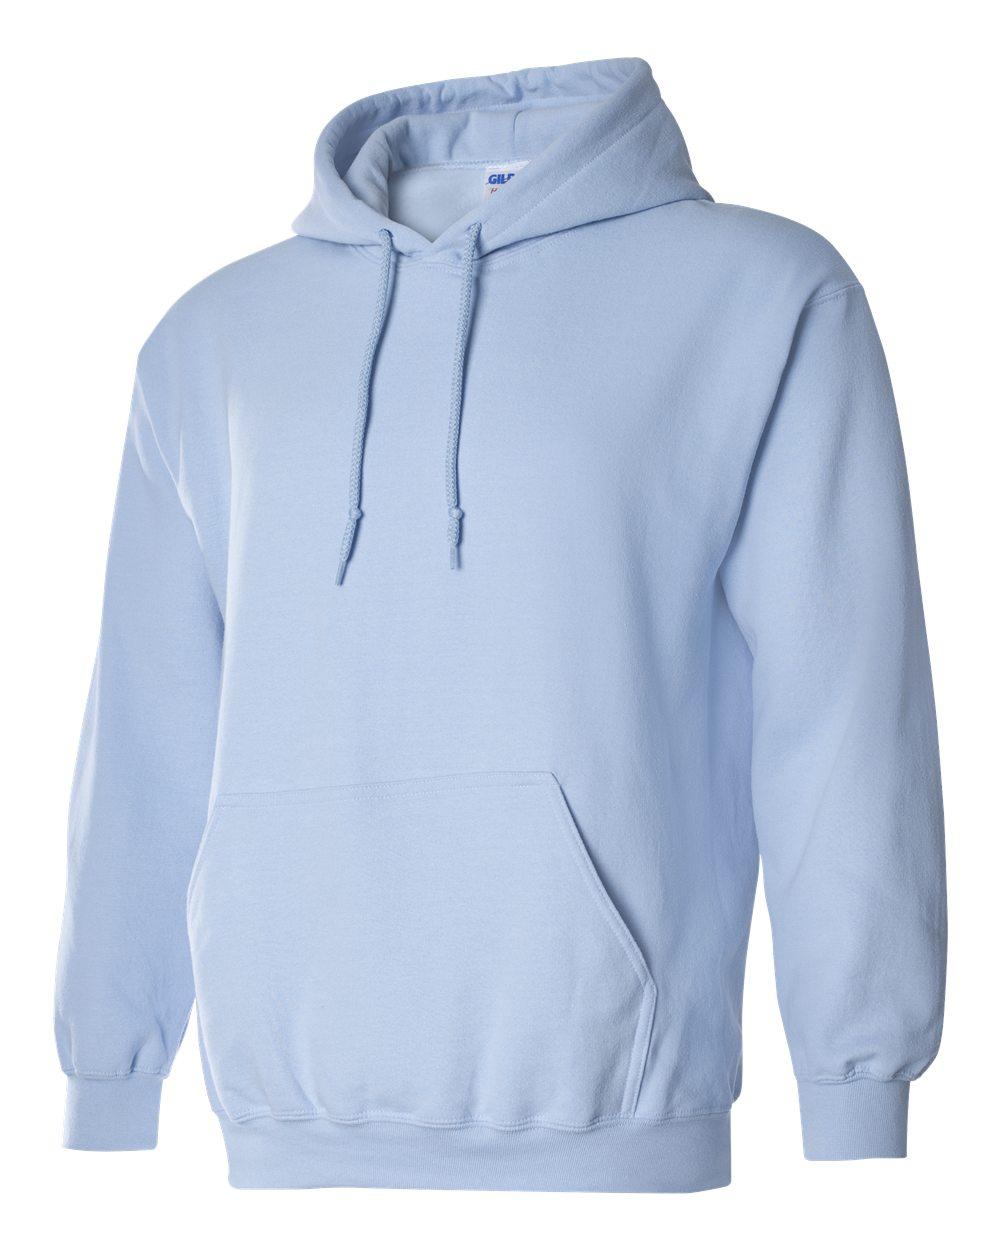 Gildan Heavy Blend Hooded Sweatshirt GI18500 Light Blue